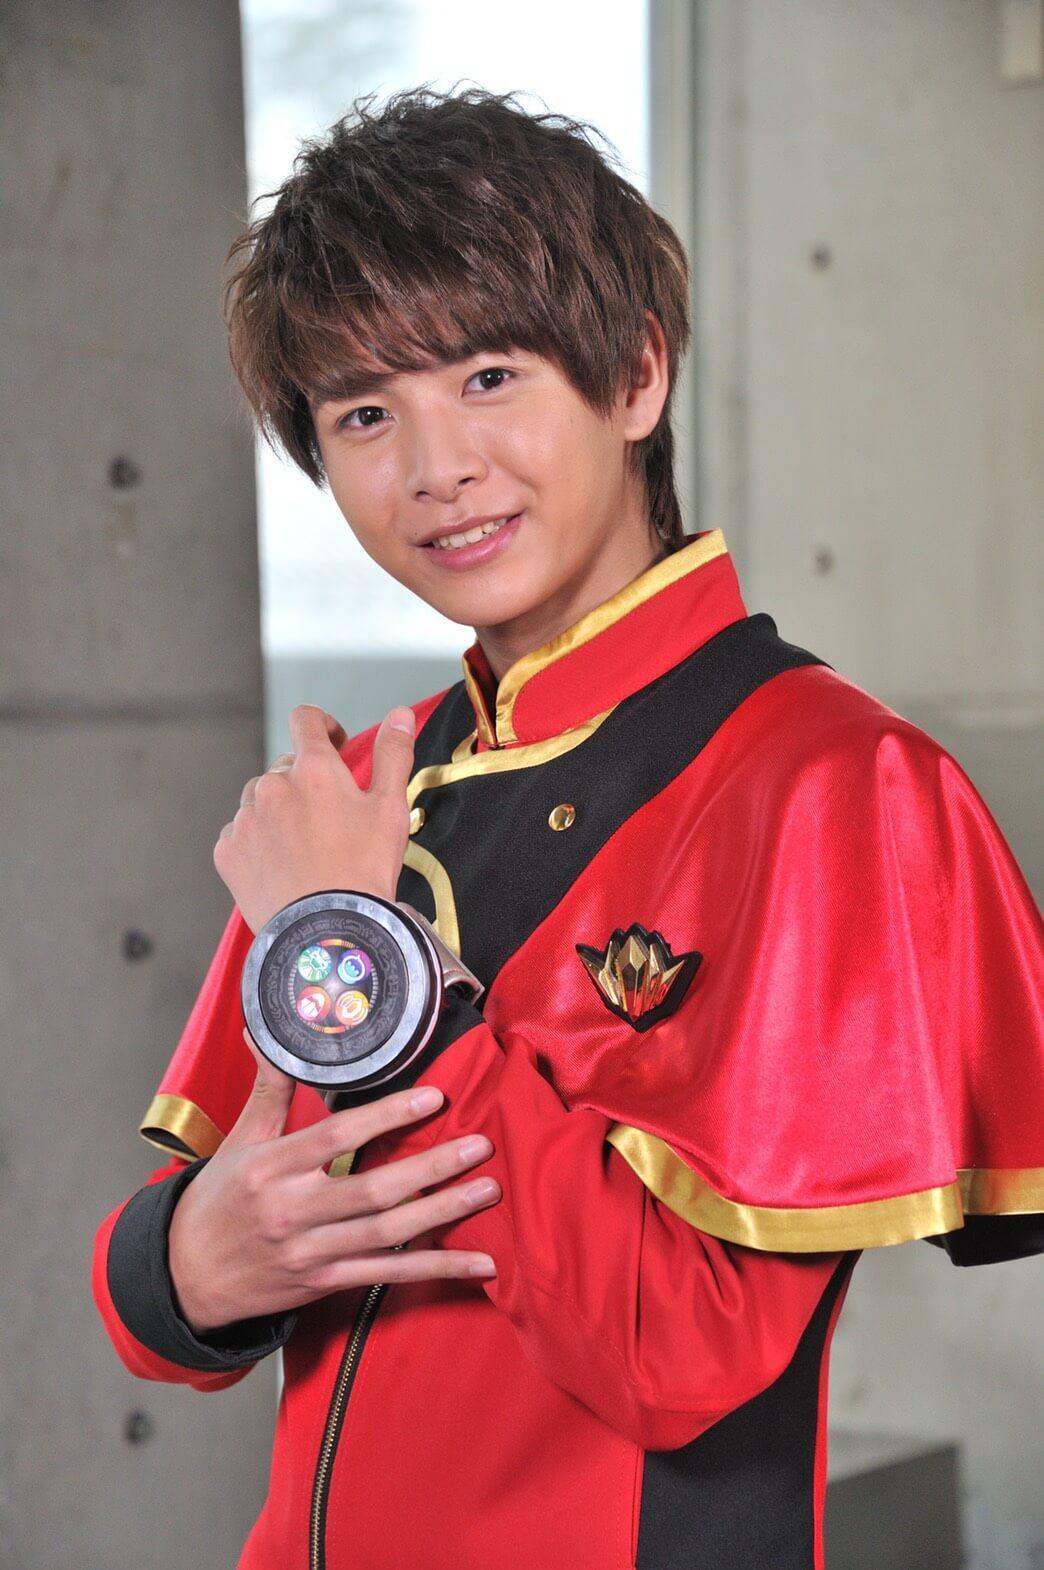 Zero PLANET小宮璃央がスーパー戦隊シリーズ『魔進戦隊キラメイジャー』キラメイレッドに大抜擢!本人コメントも到着